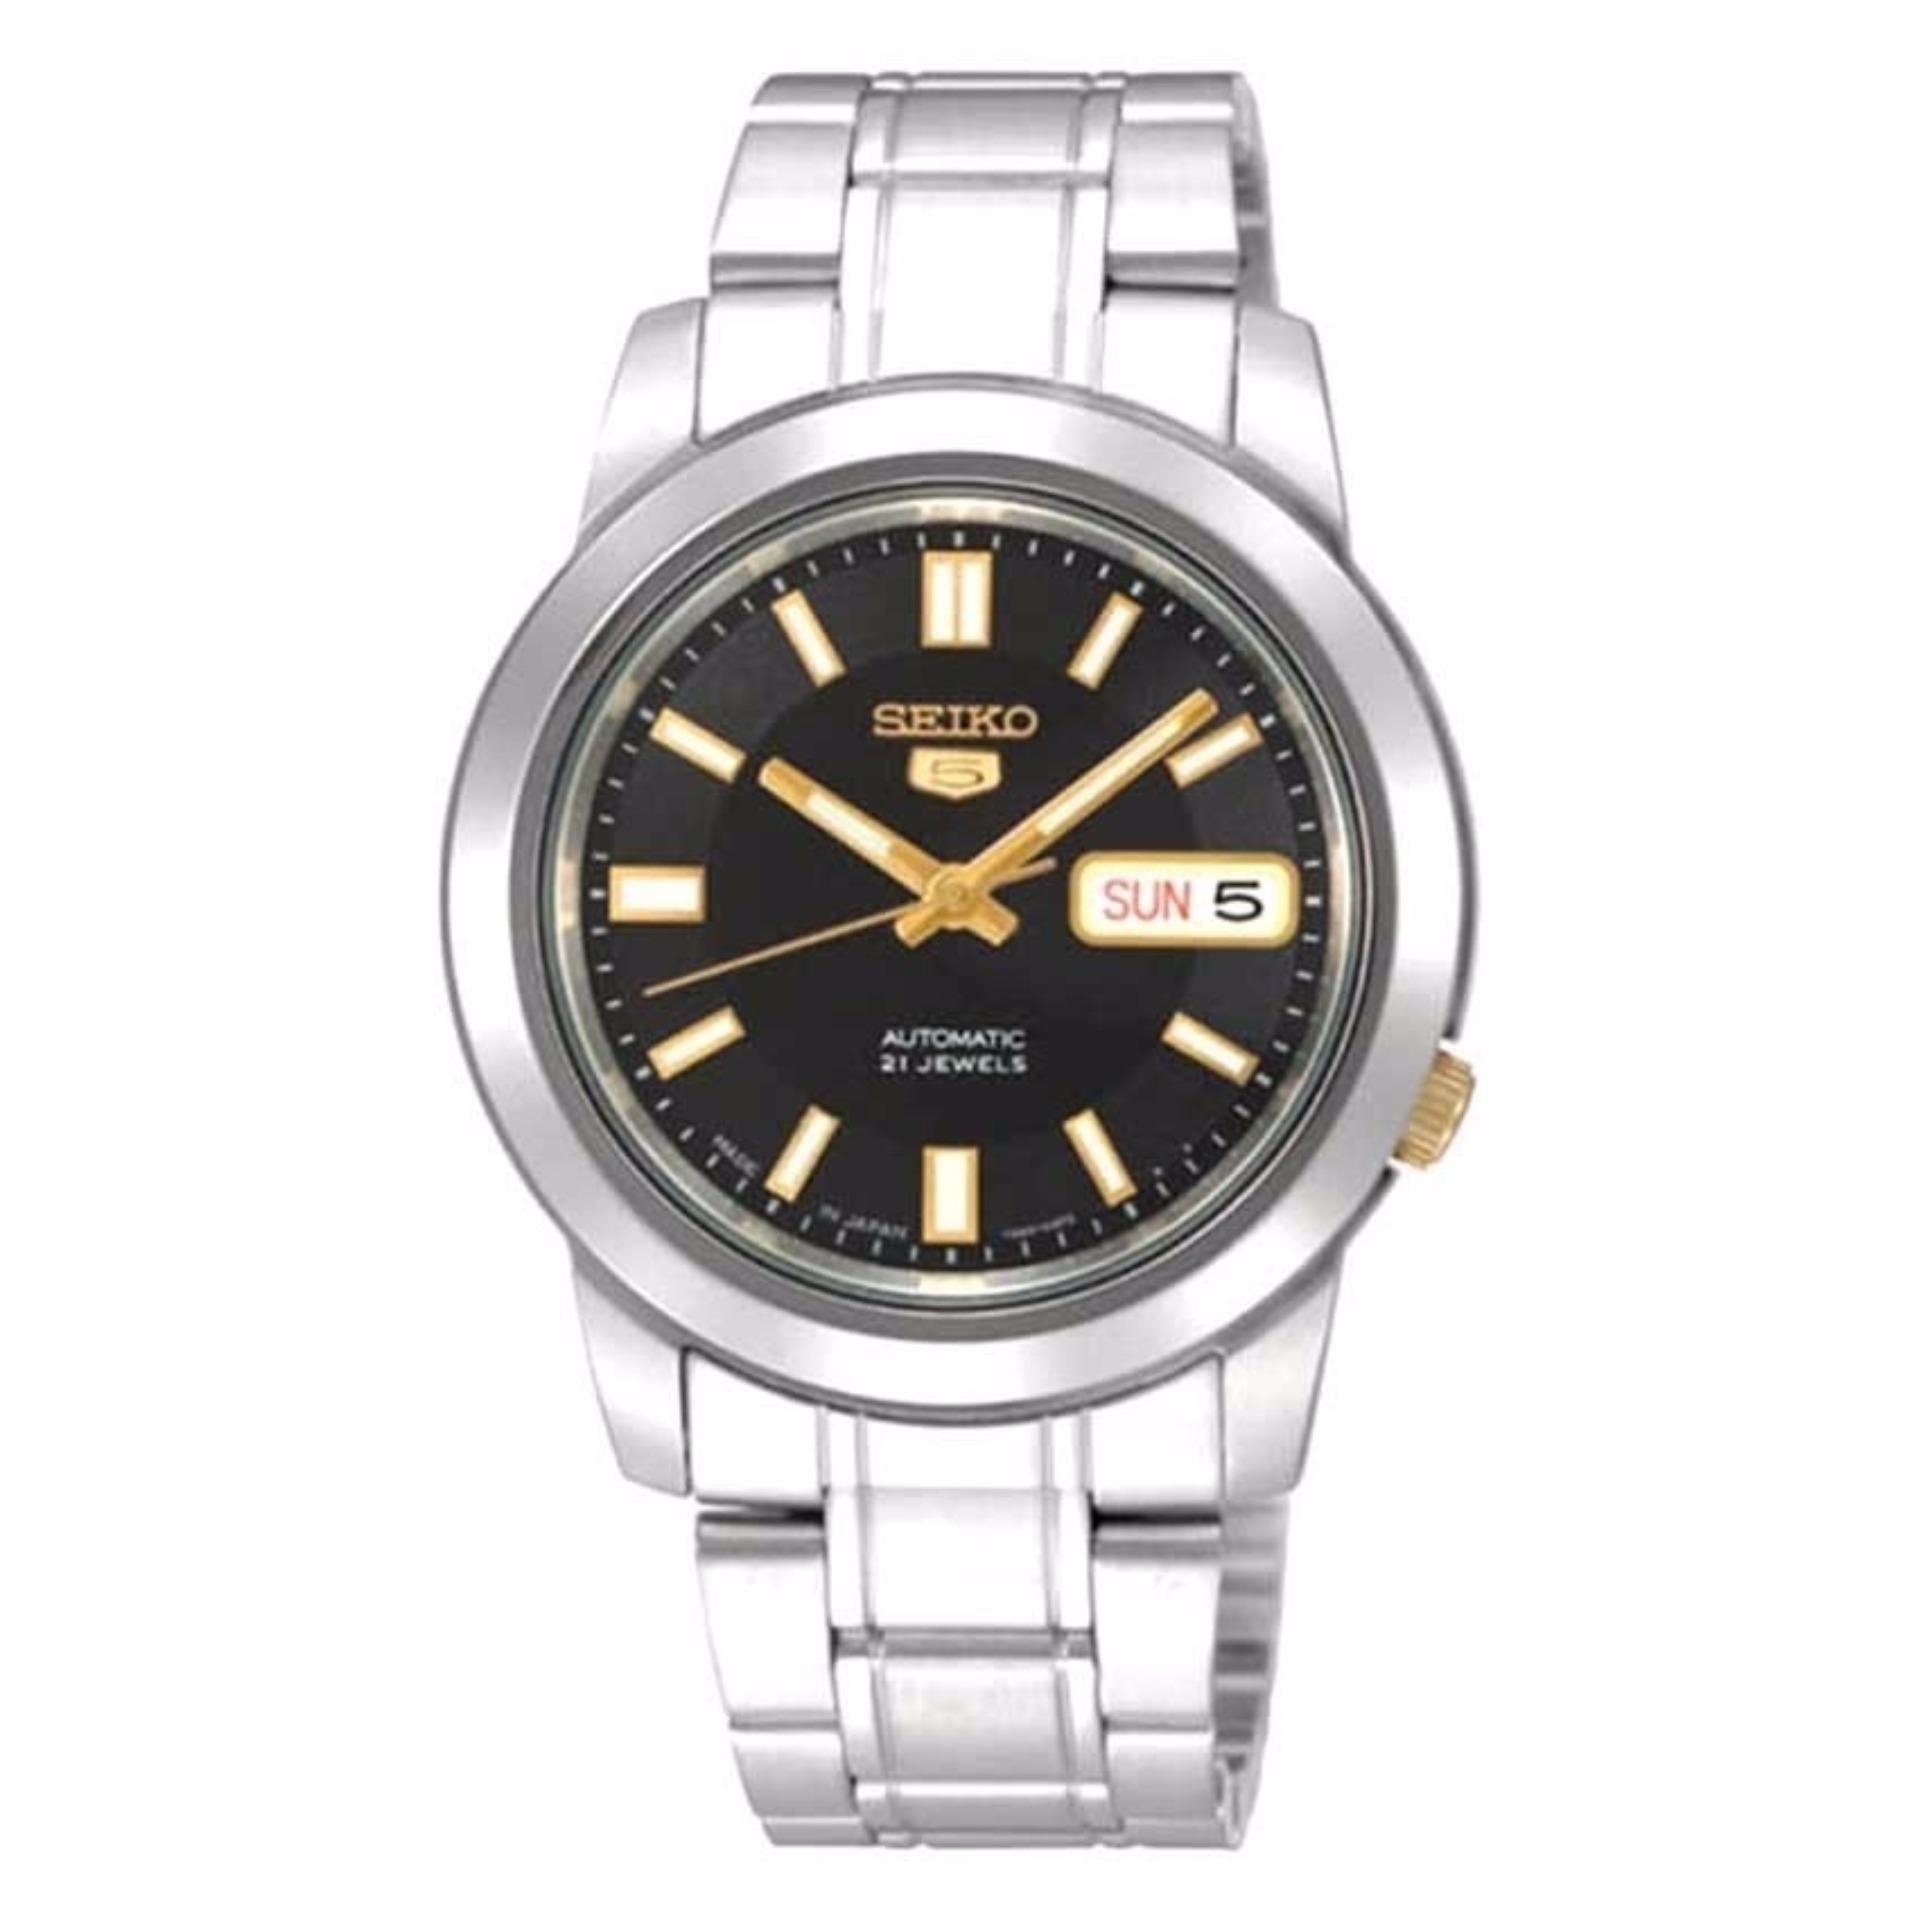 Seiko 5 Snkk17K1 Snkk17K Snkk17 Automatic Stainless Steel Black Dial Analog Men Watches In Stock